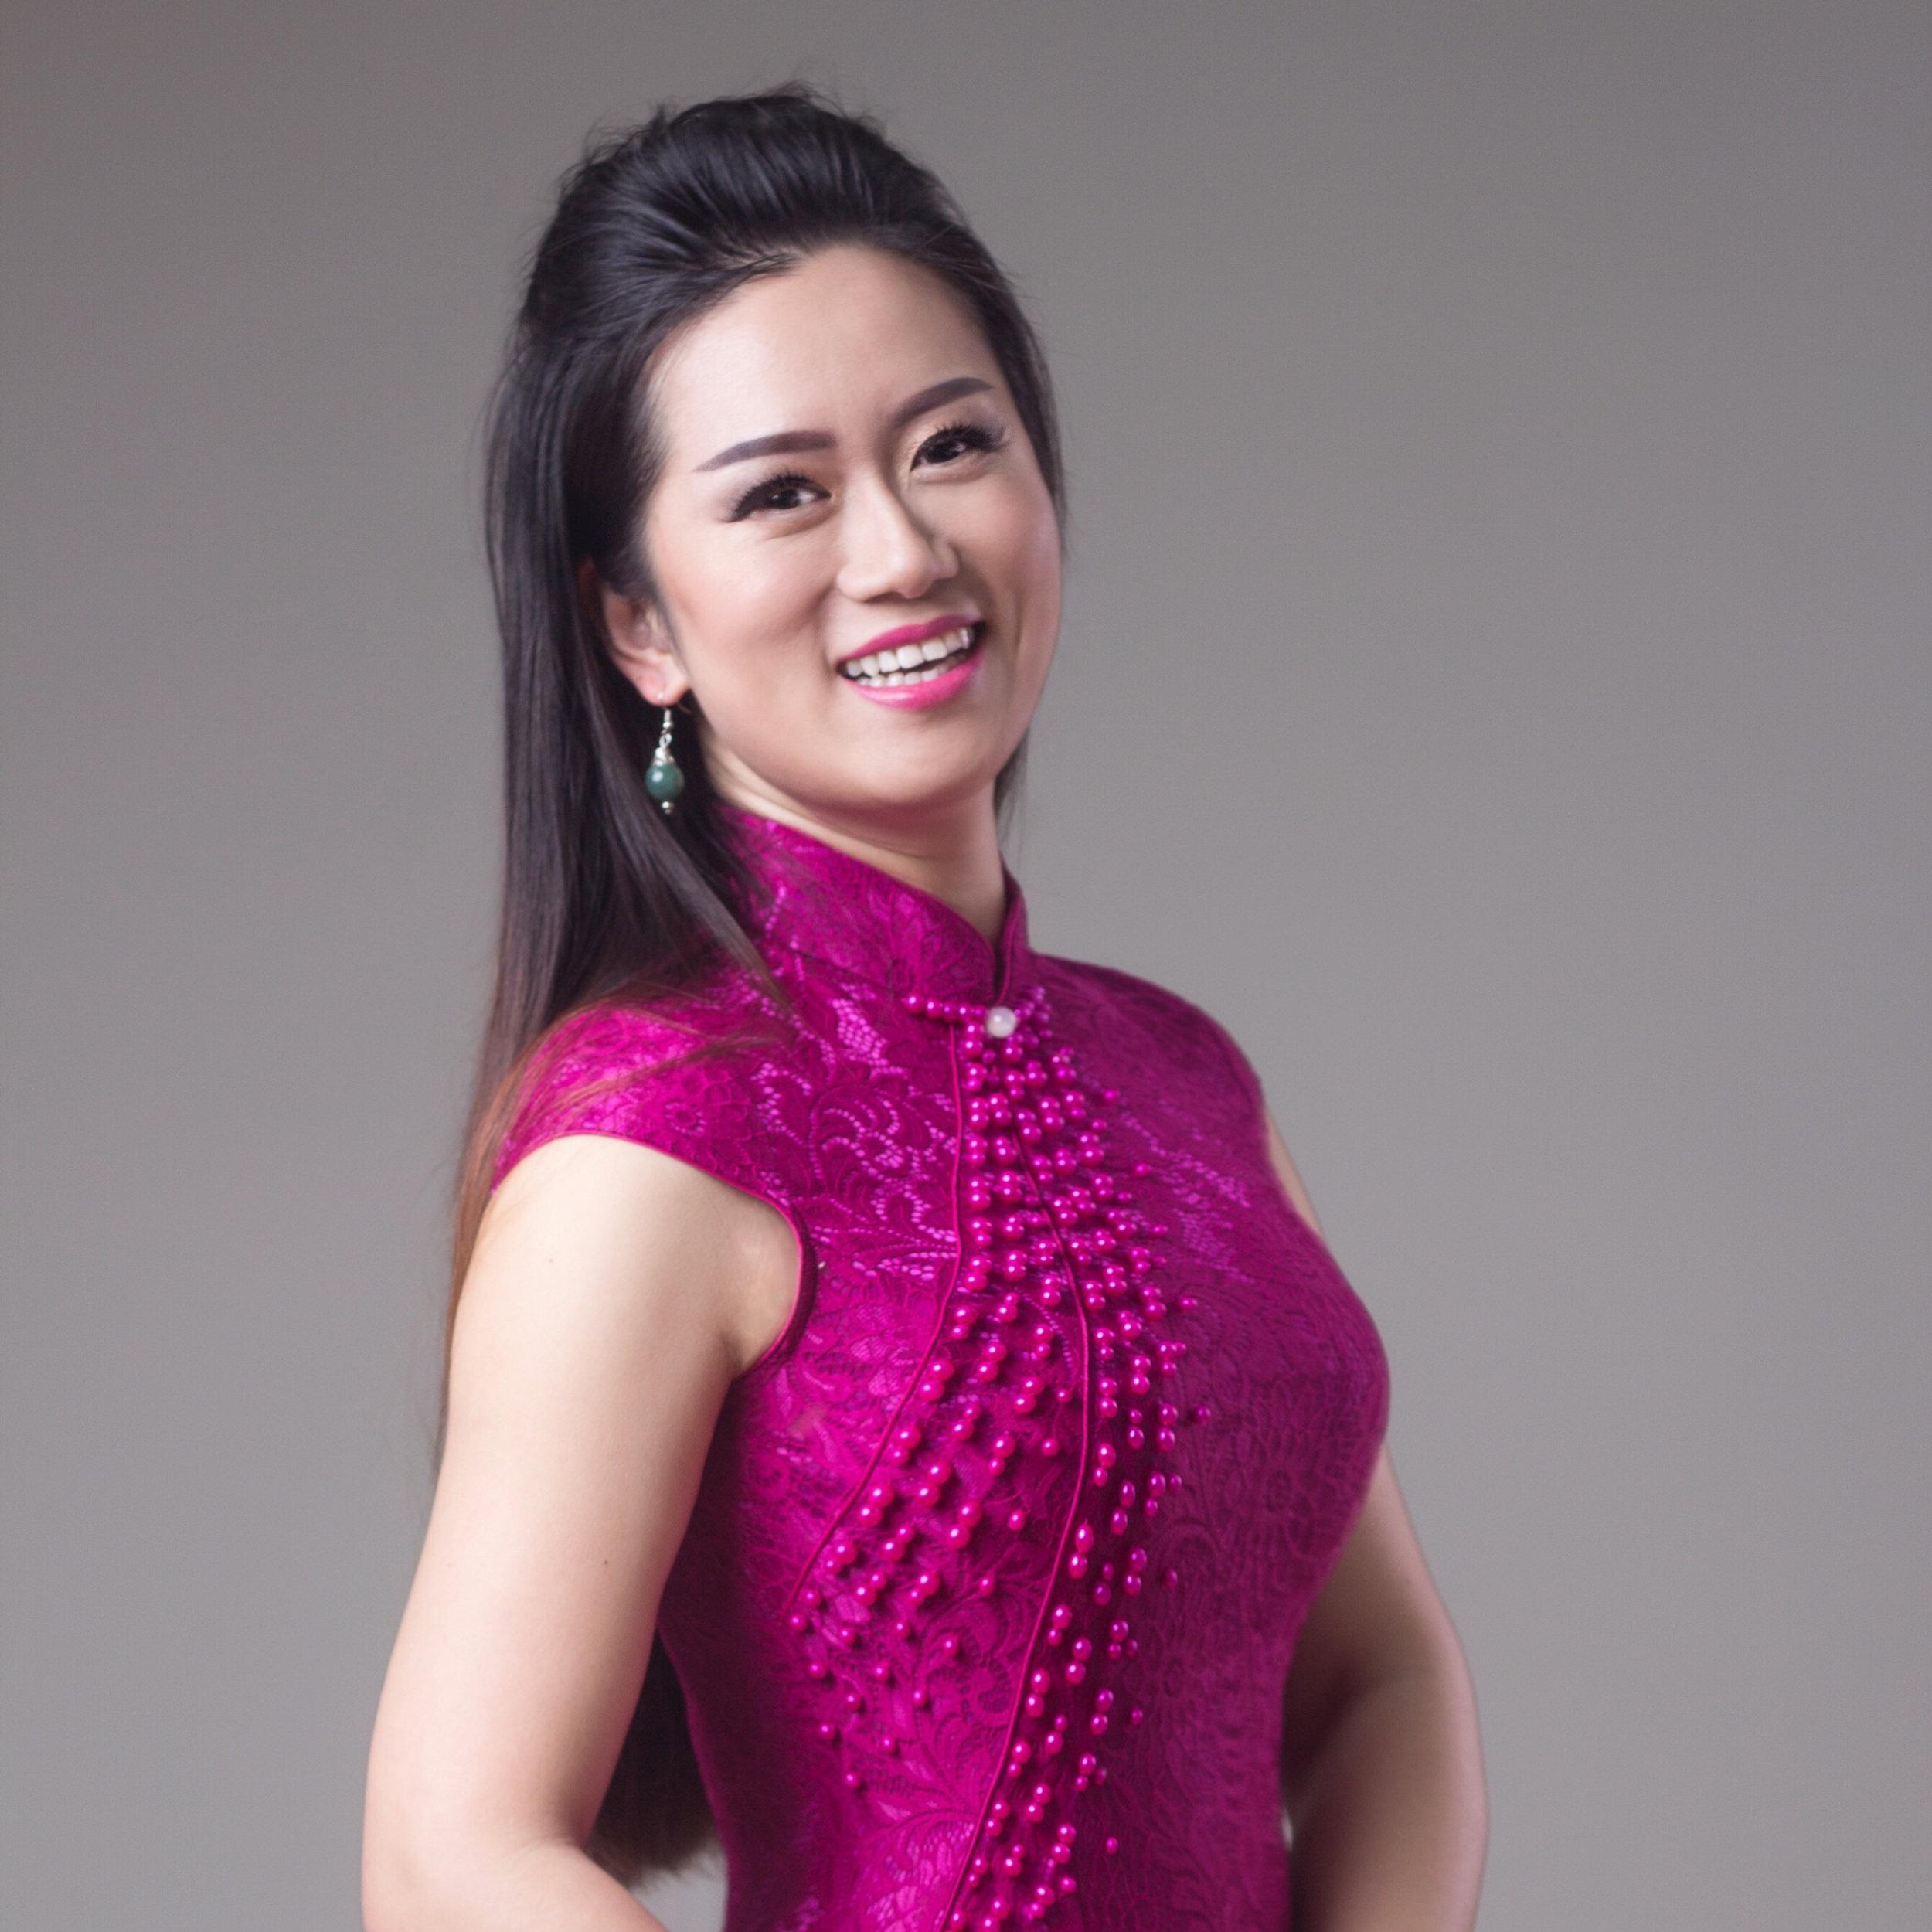 Wanzhe Zhang - Boston Chinese Musicians Association旅美女高音歌唱家波士顿中国音乐家协会会长